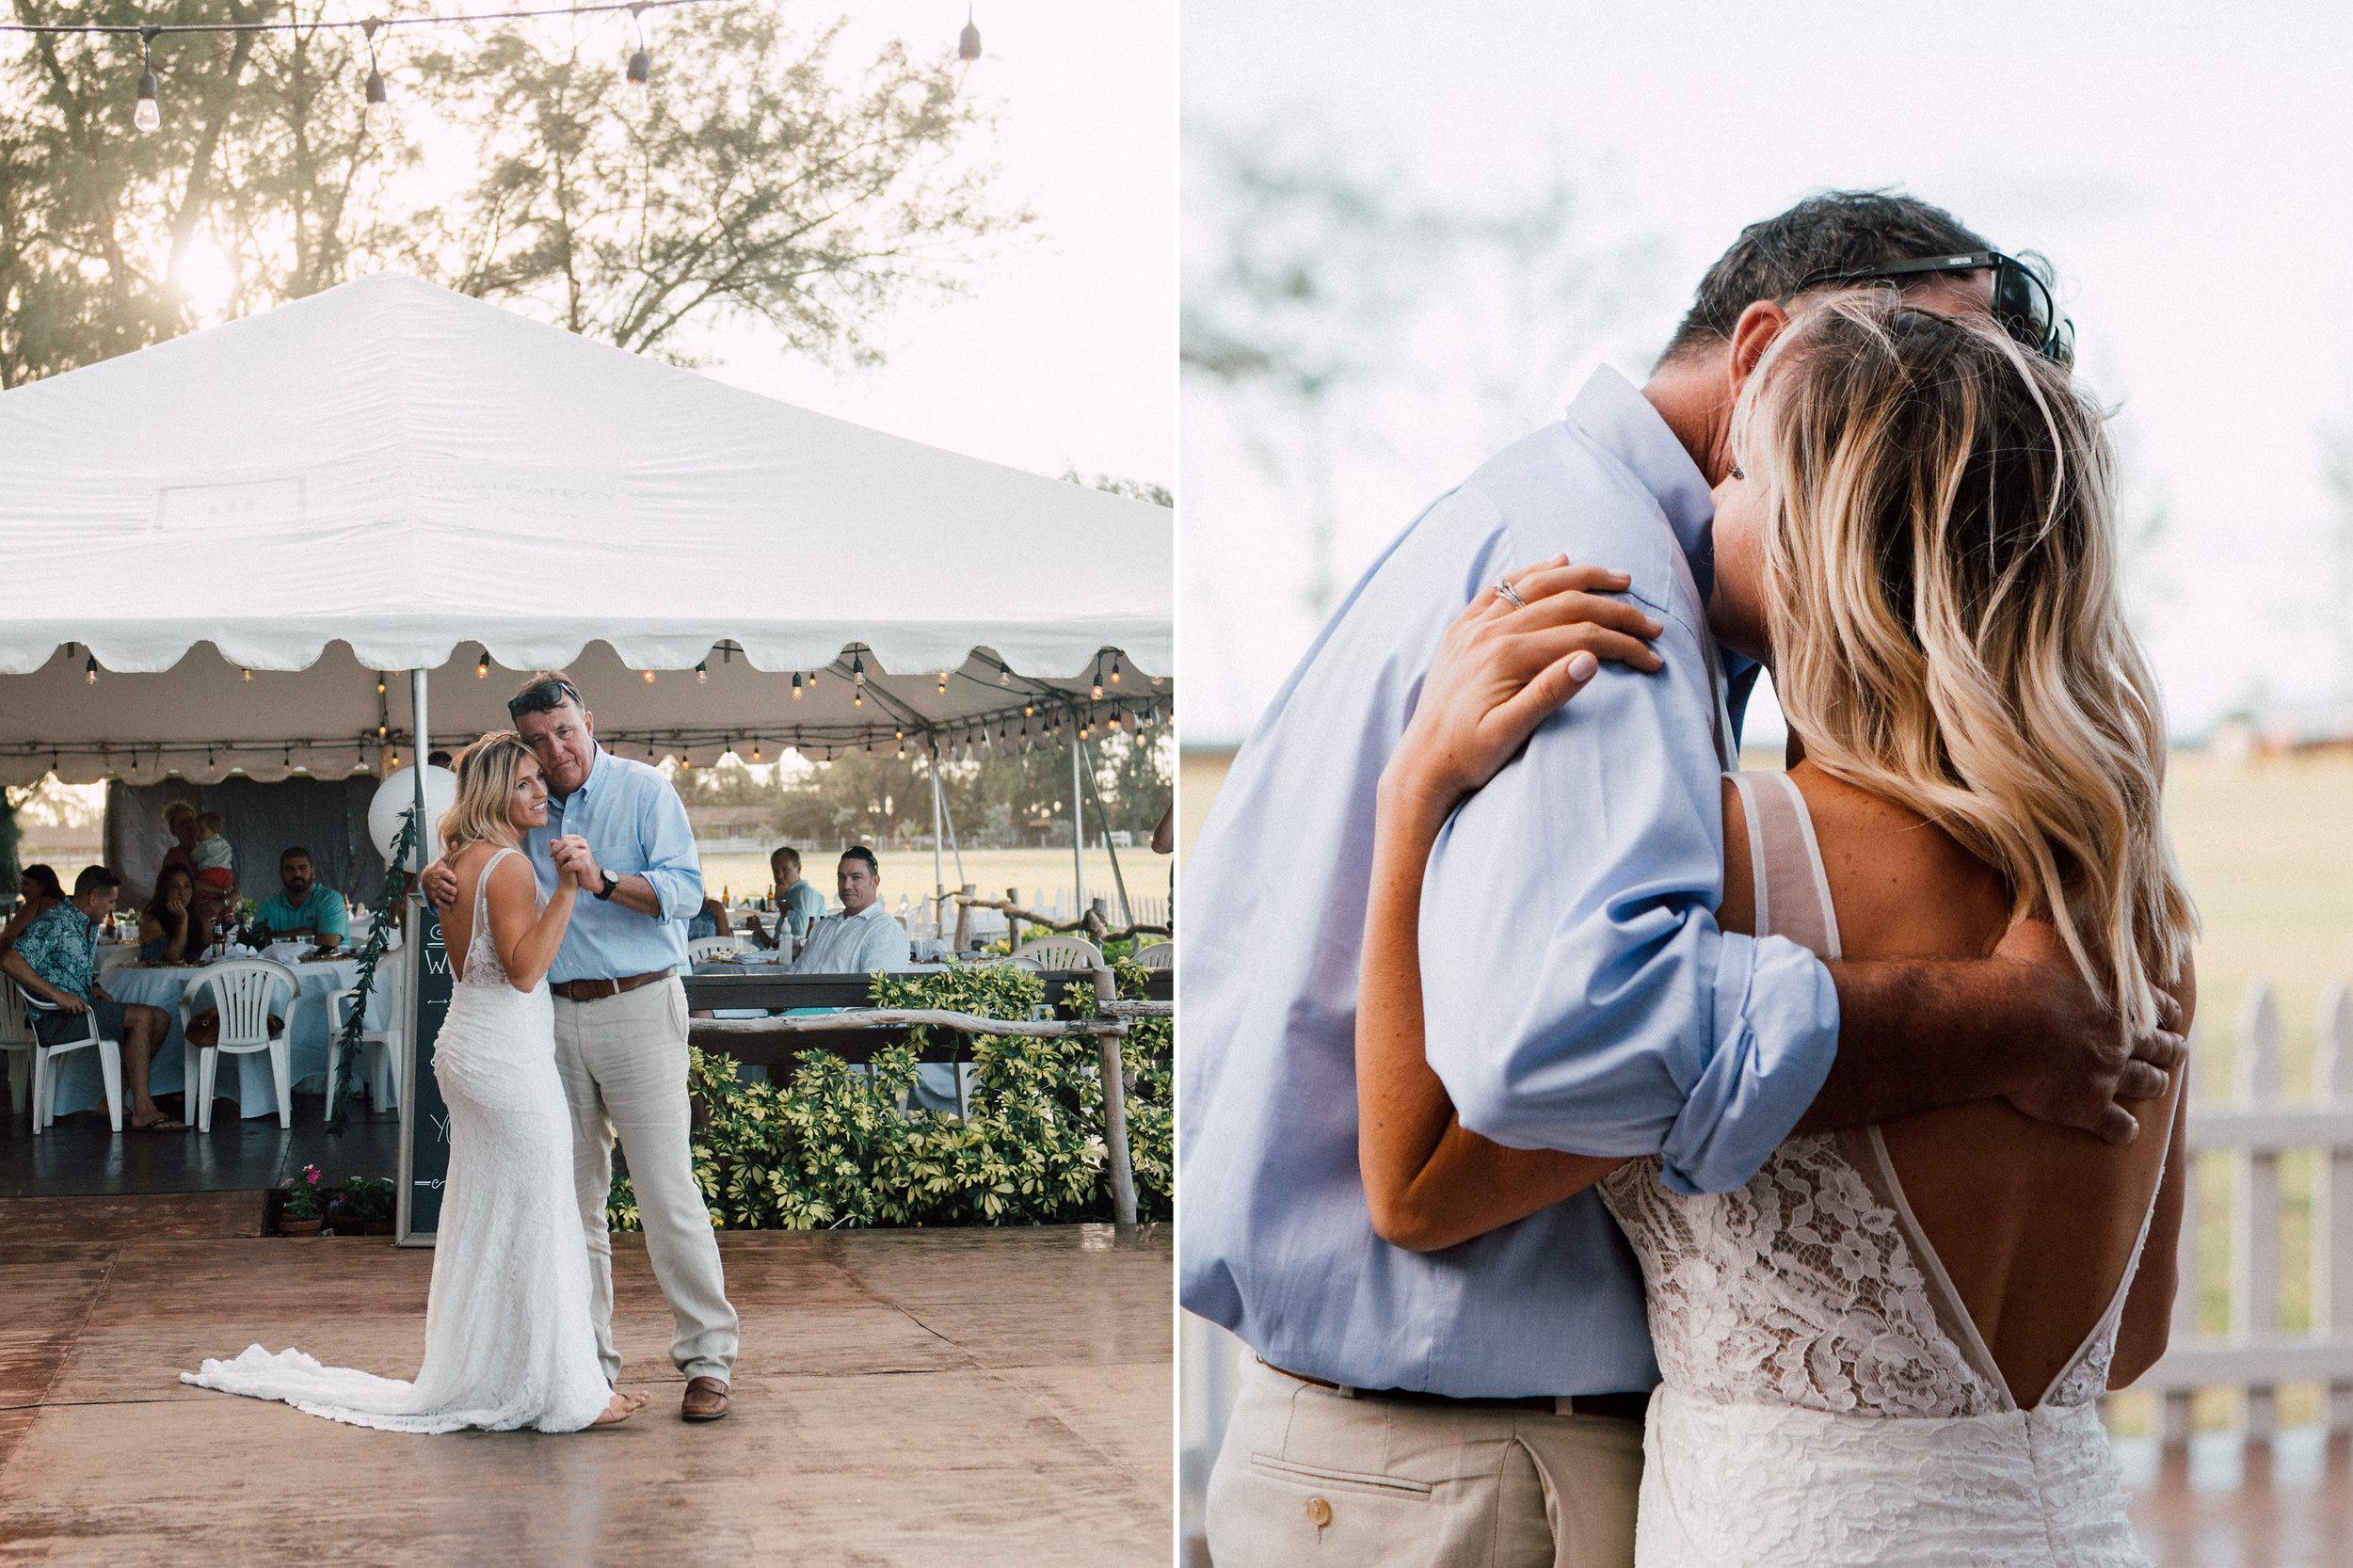 Drew + Layne North Shore Oahu Hawaii Wedding 1.jpg